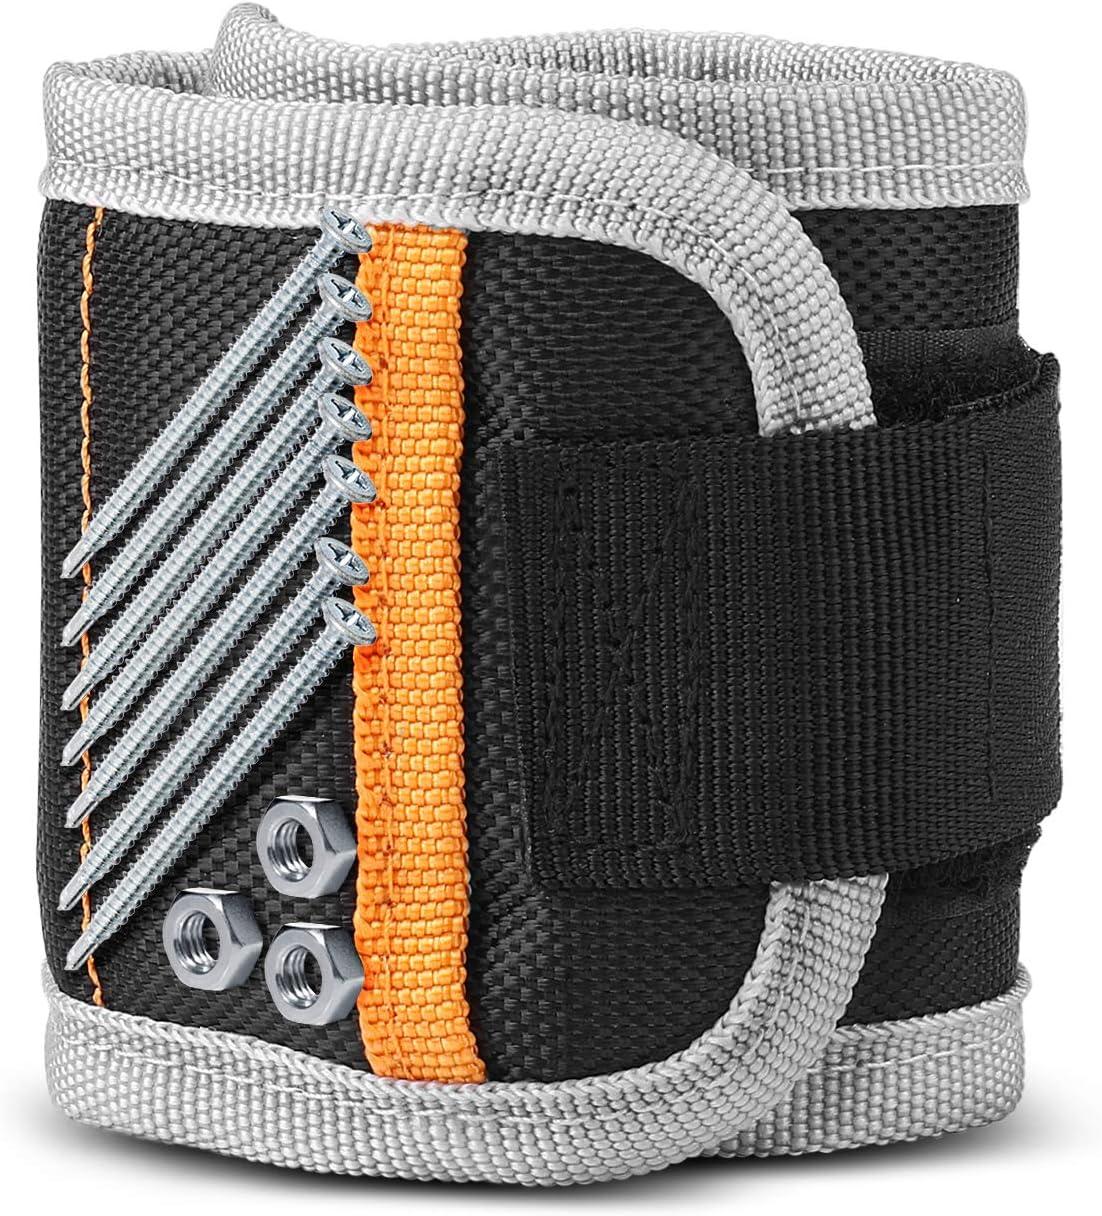 Flexzion Magnetic Popular brand Wrist Band Wristband Tool Holder Alternative dealer Wris